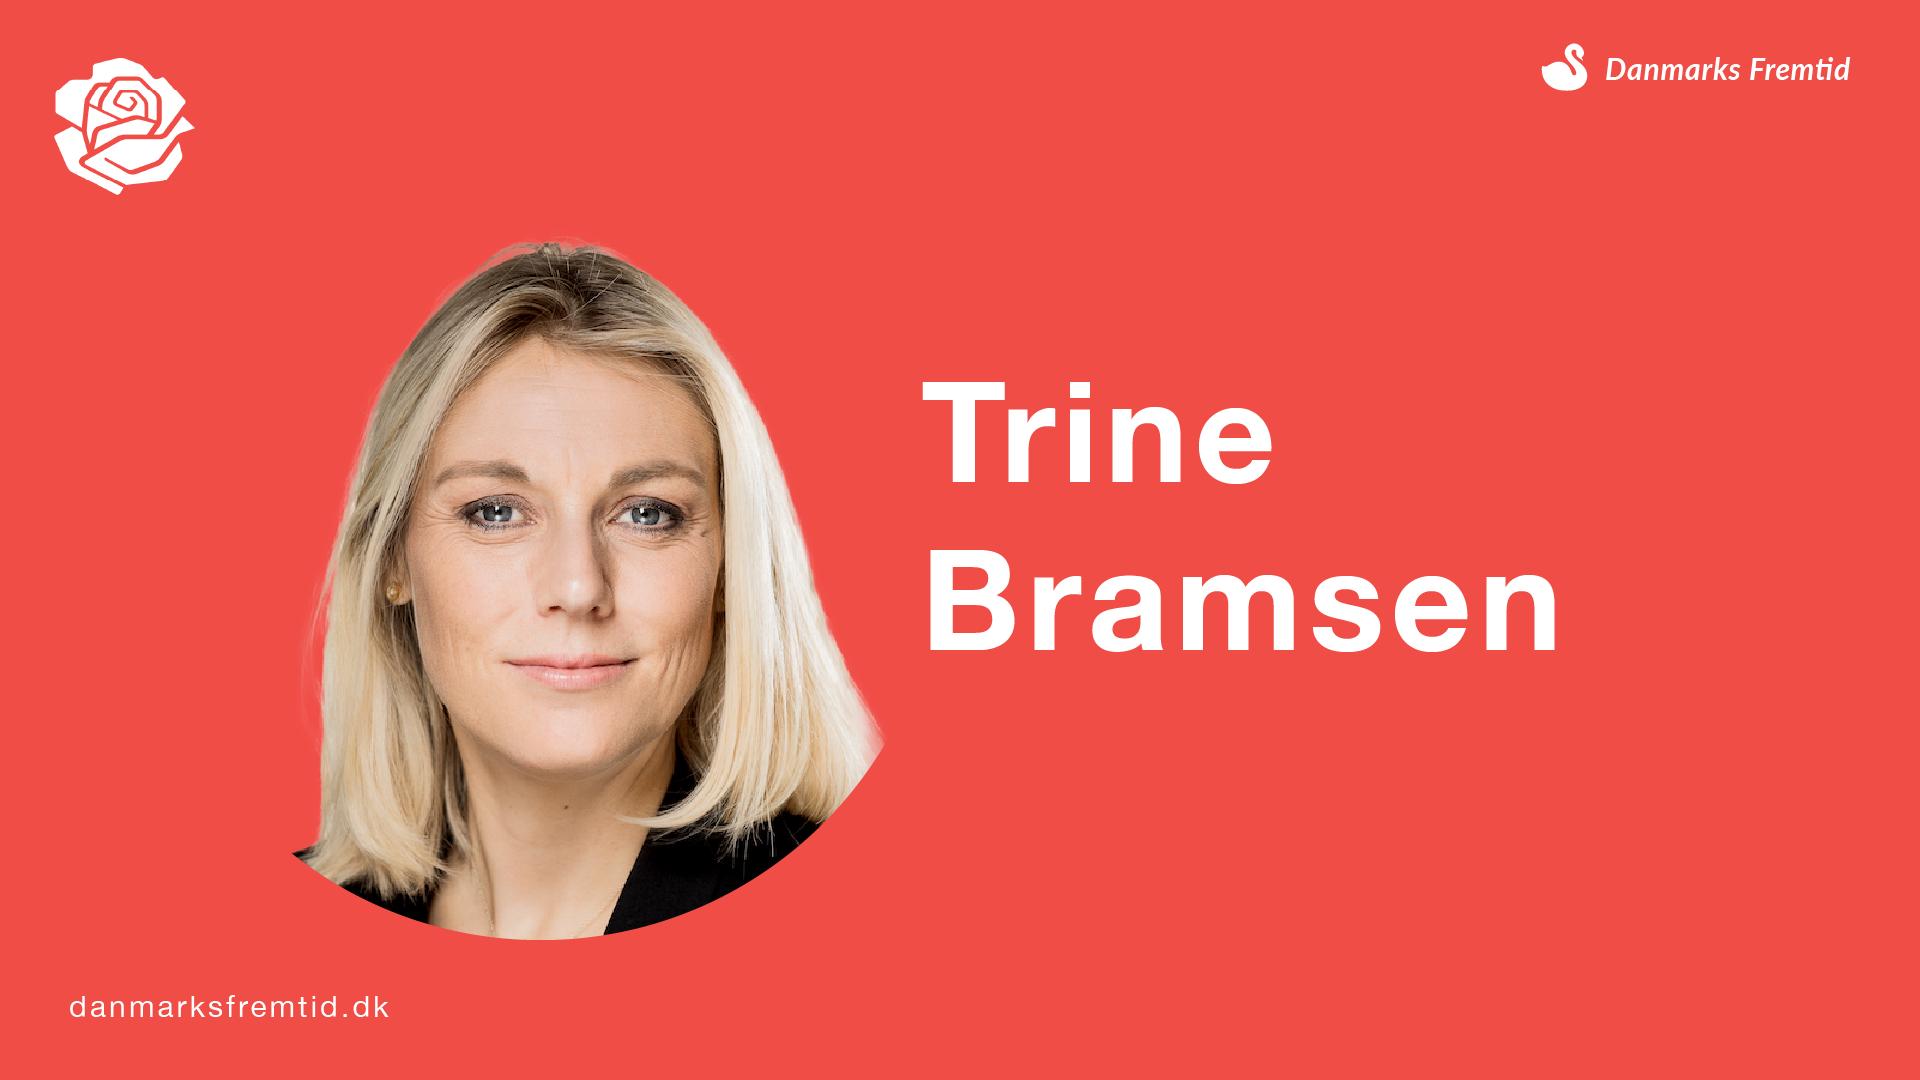 Trine Bramsen - Socialdemokratiet